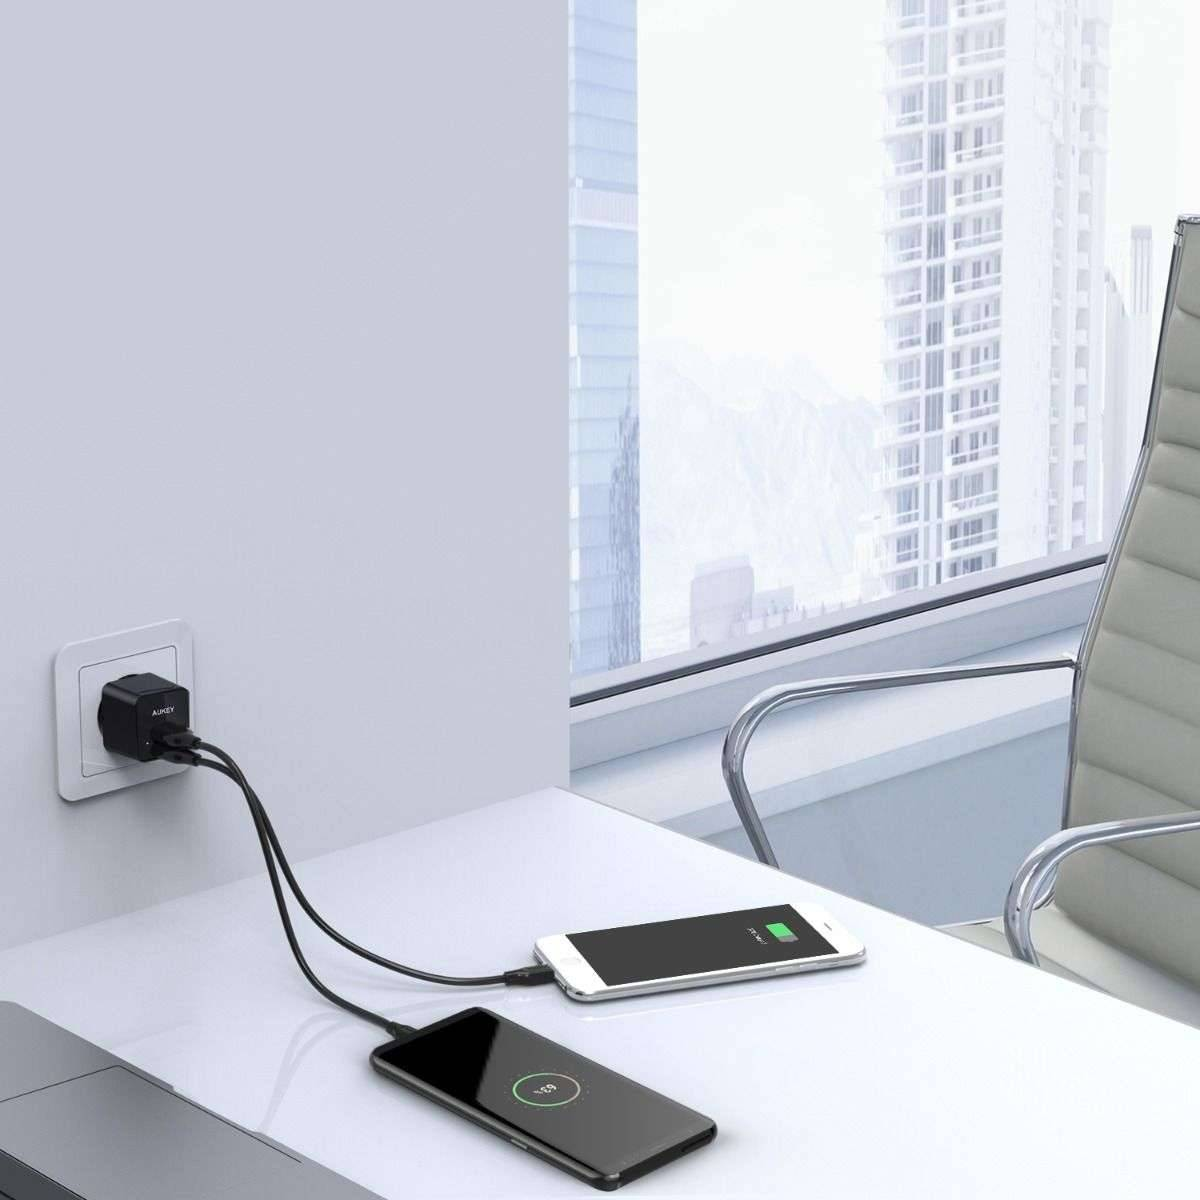 Aukey Dual USB lader 2x USB lader (opptil 12W) Mackabler